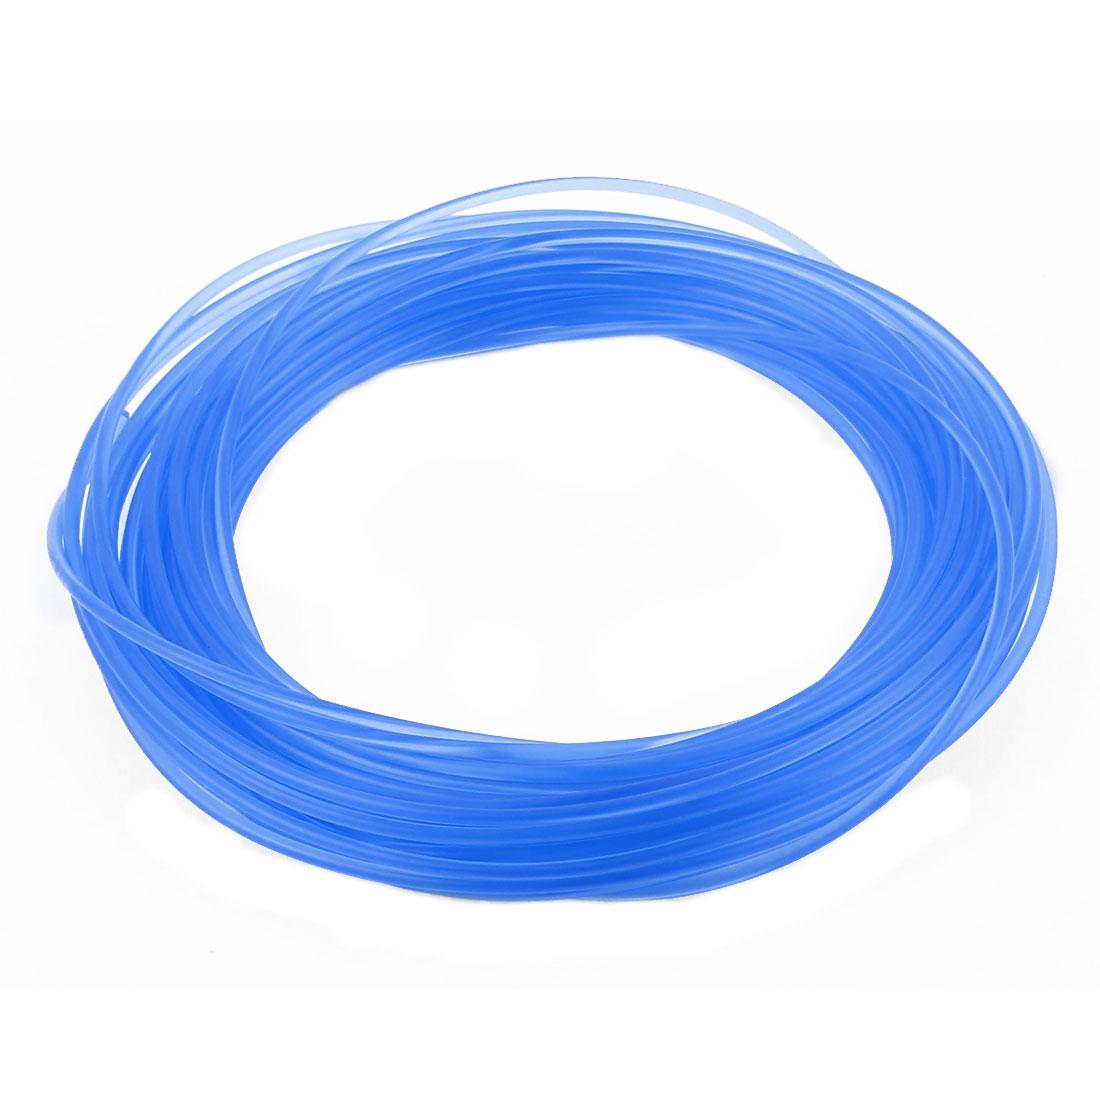 10m 3D Printer Pen Painting Filament Refills ABS Printing Material Transparent Blue